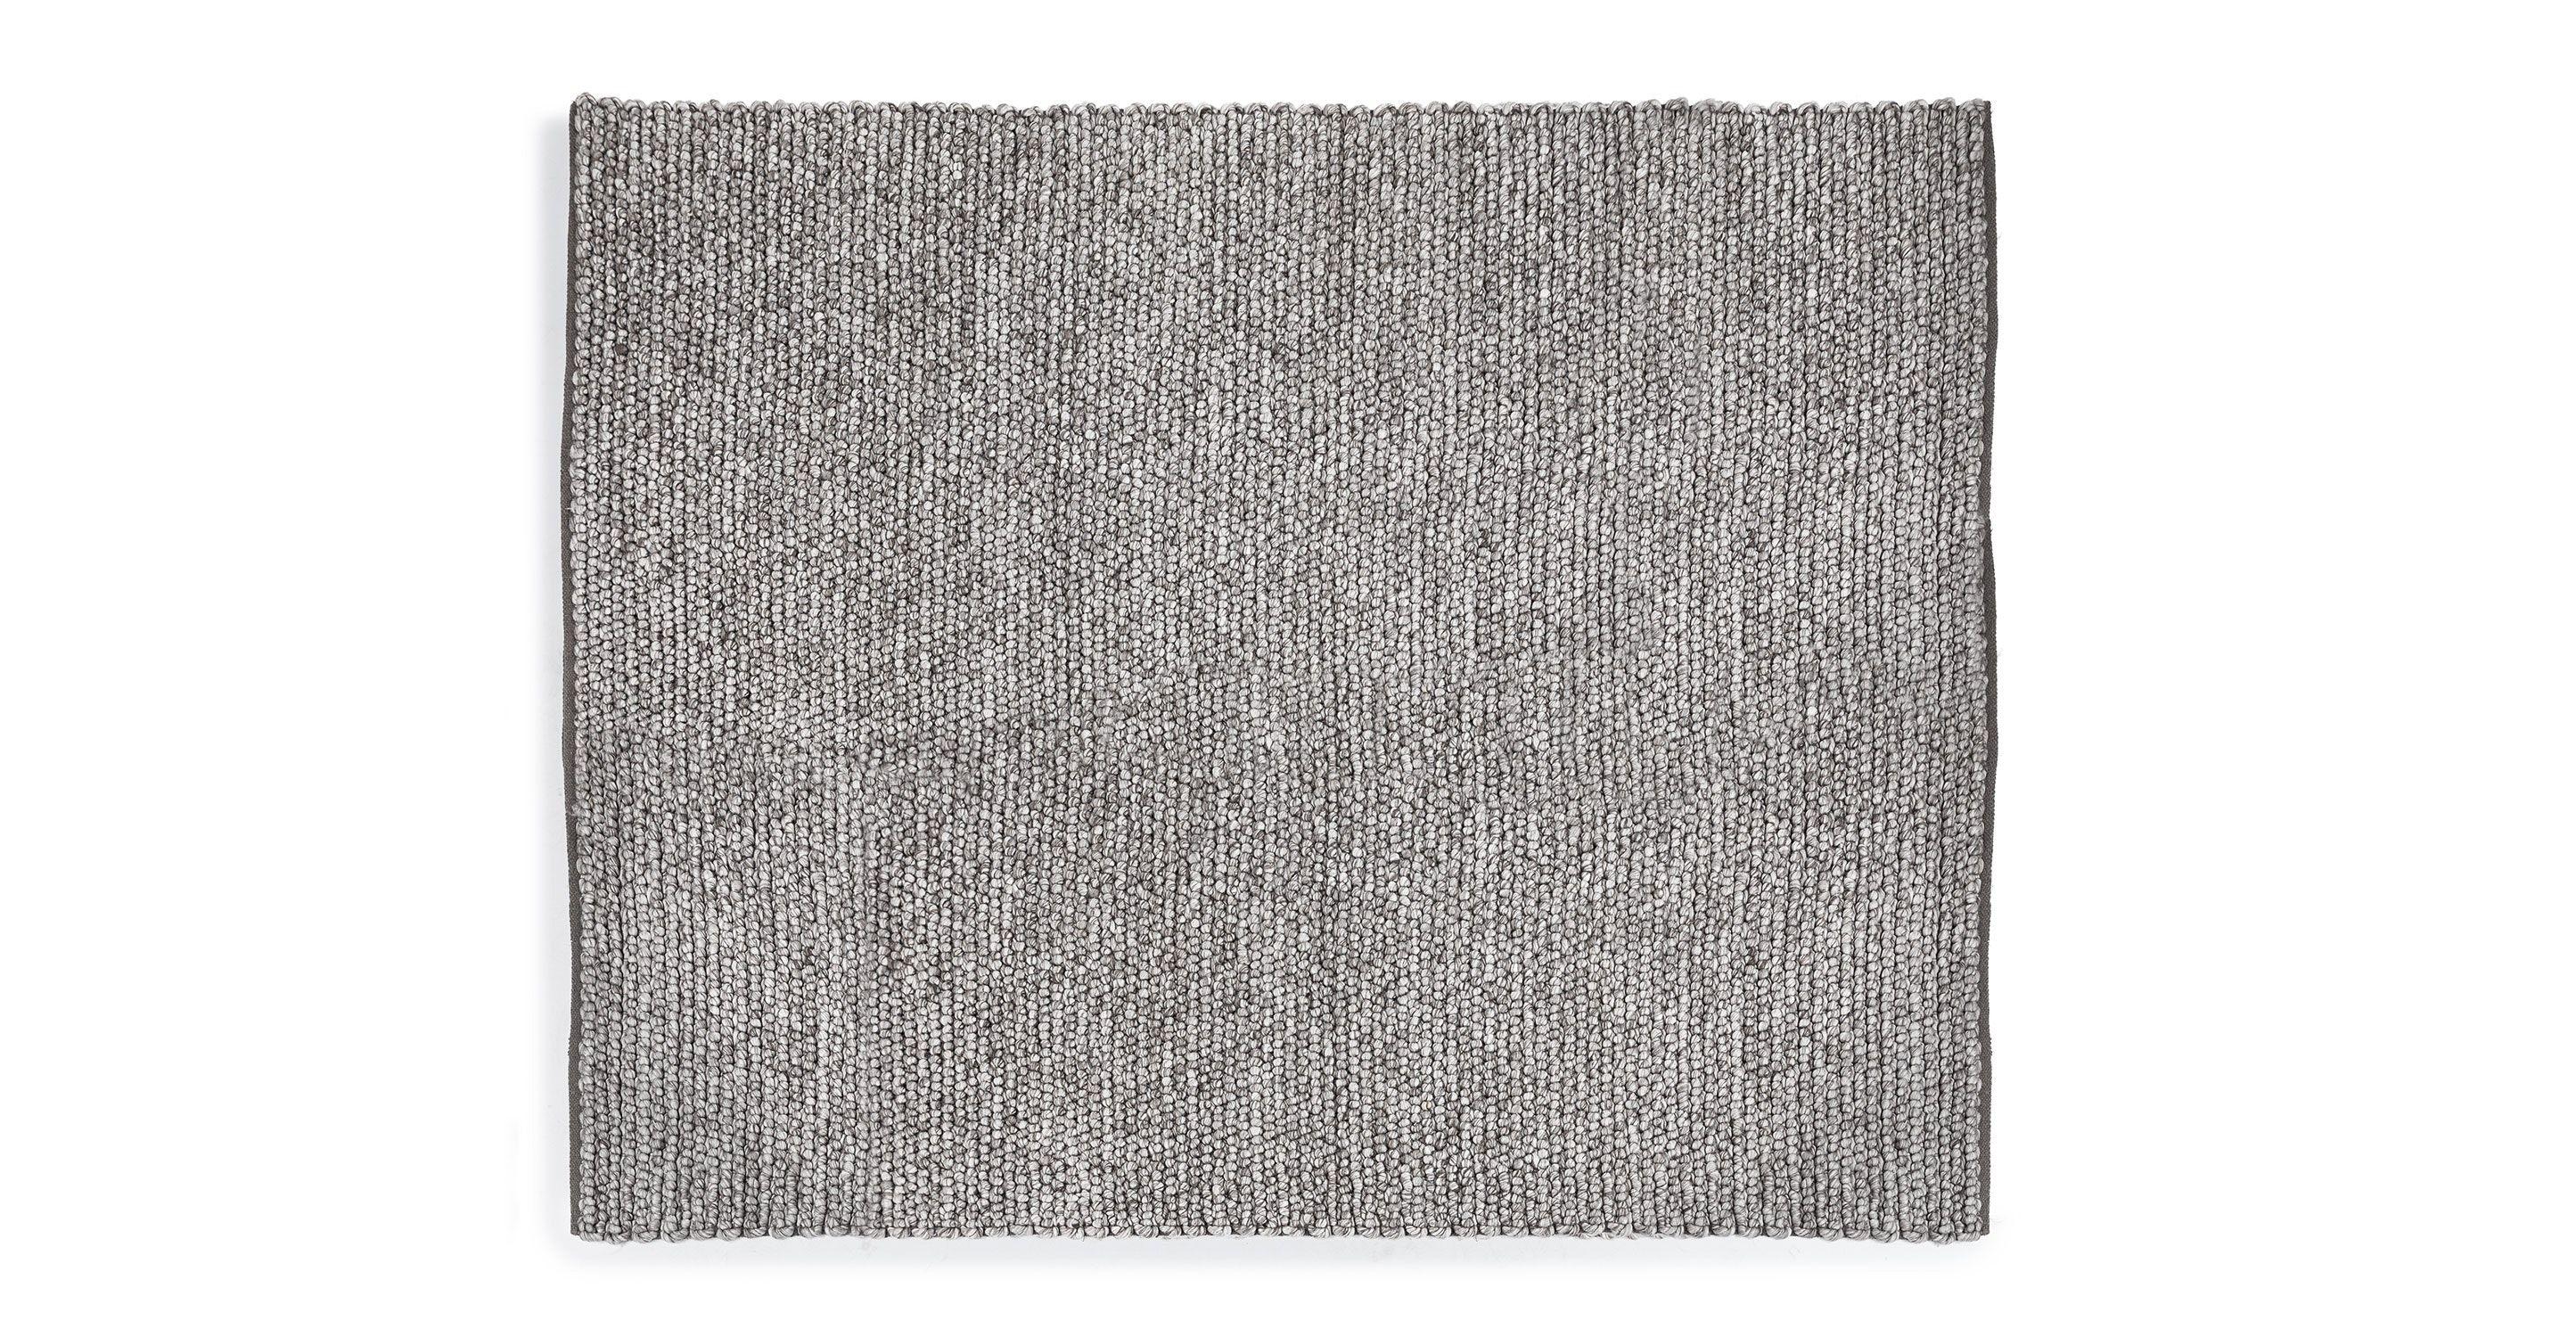 Hira Metal Gray Rug 8 X 10 Grey Rugs Scandinavian Rug Rugs